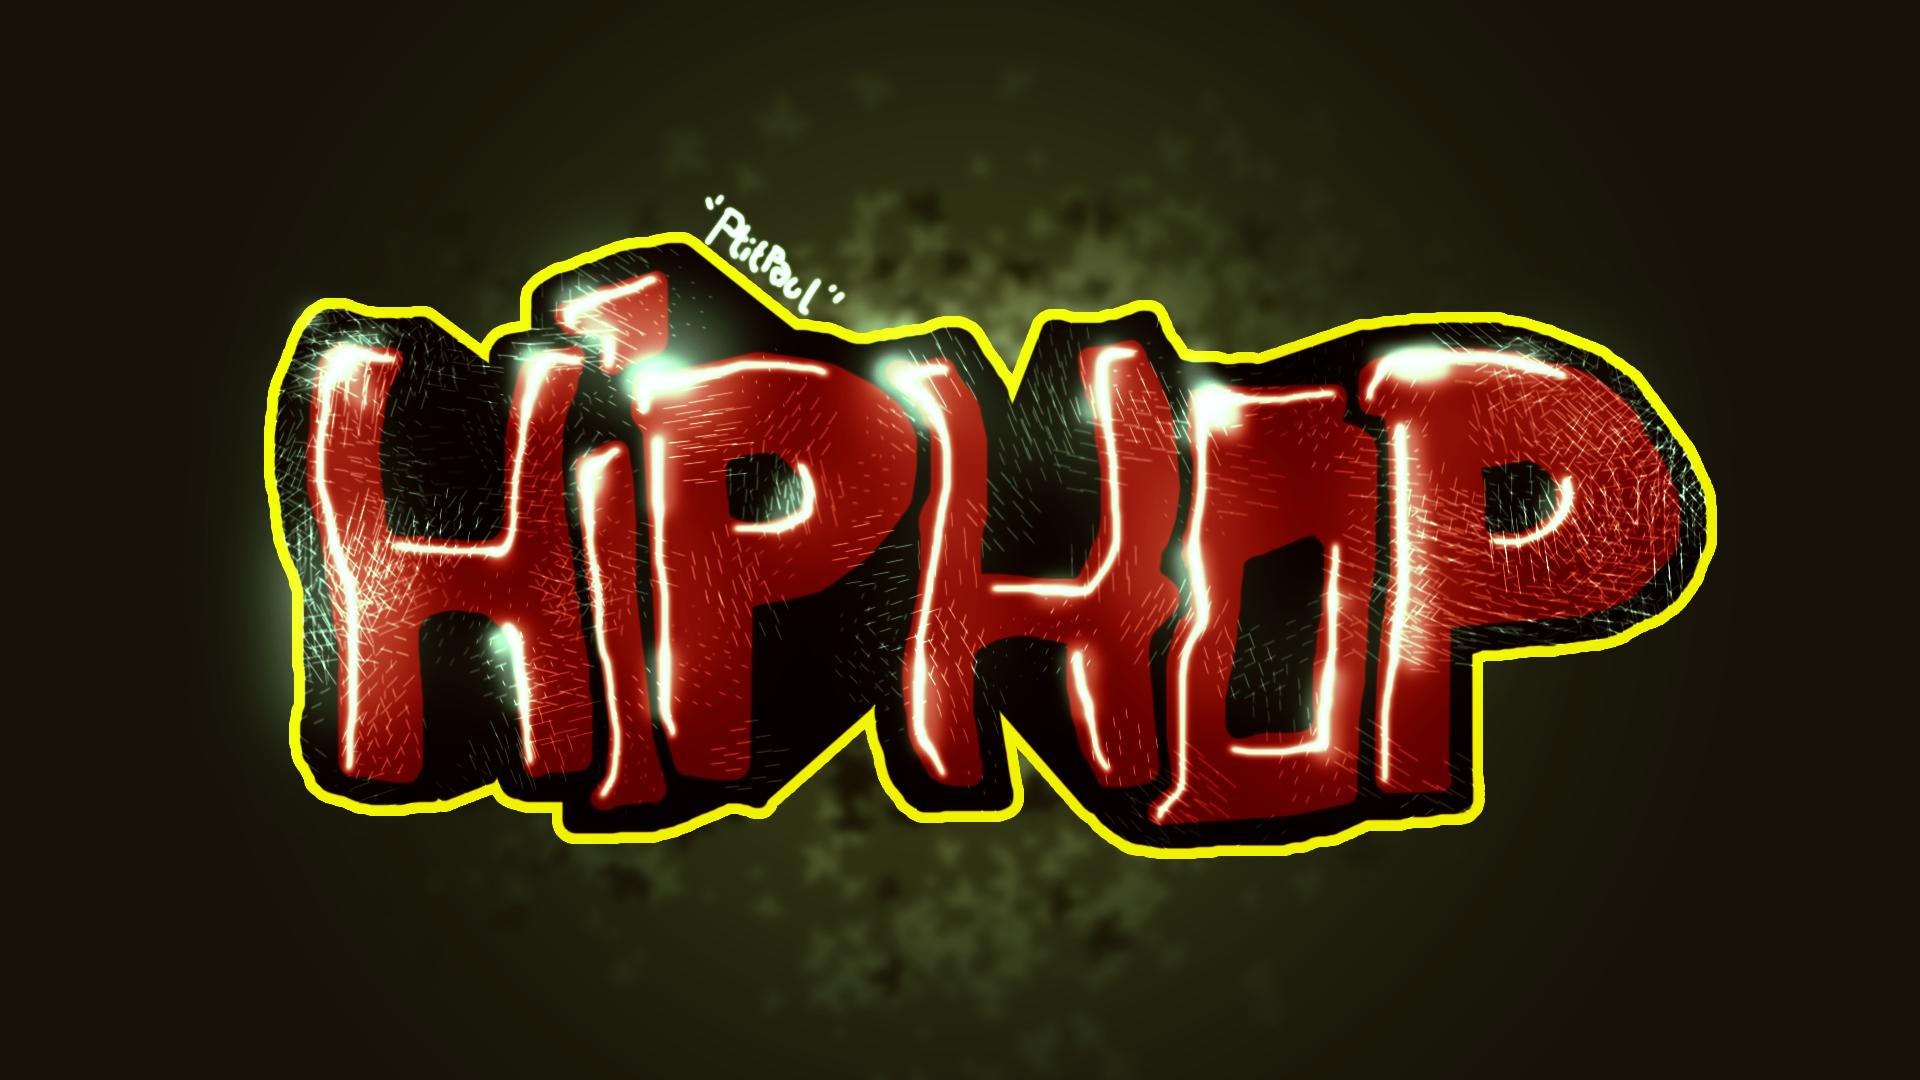 Hip Hop Graffiti Art Wallpaper - WallpaperSafari